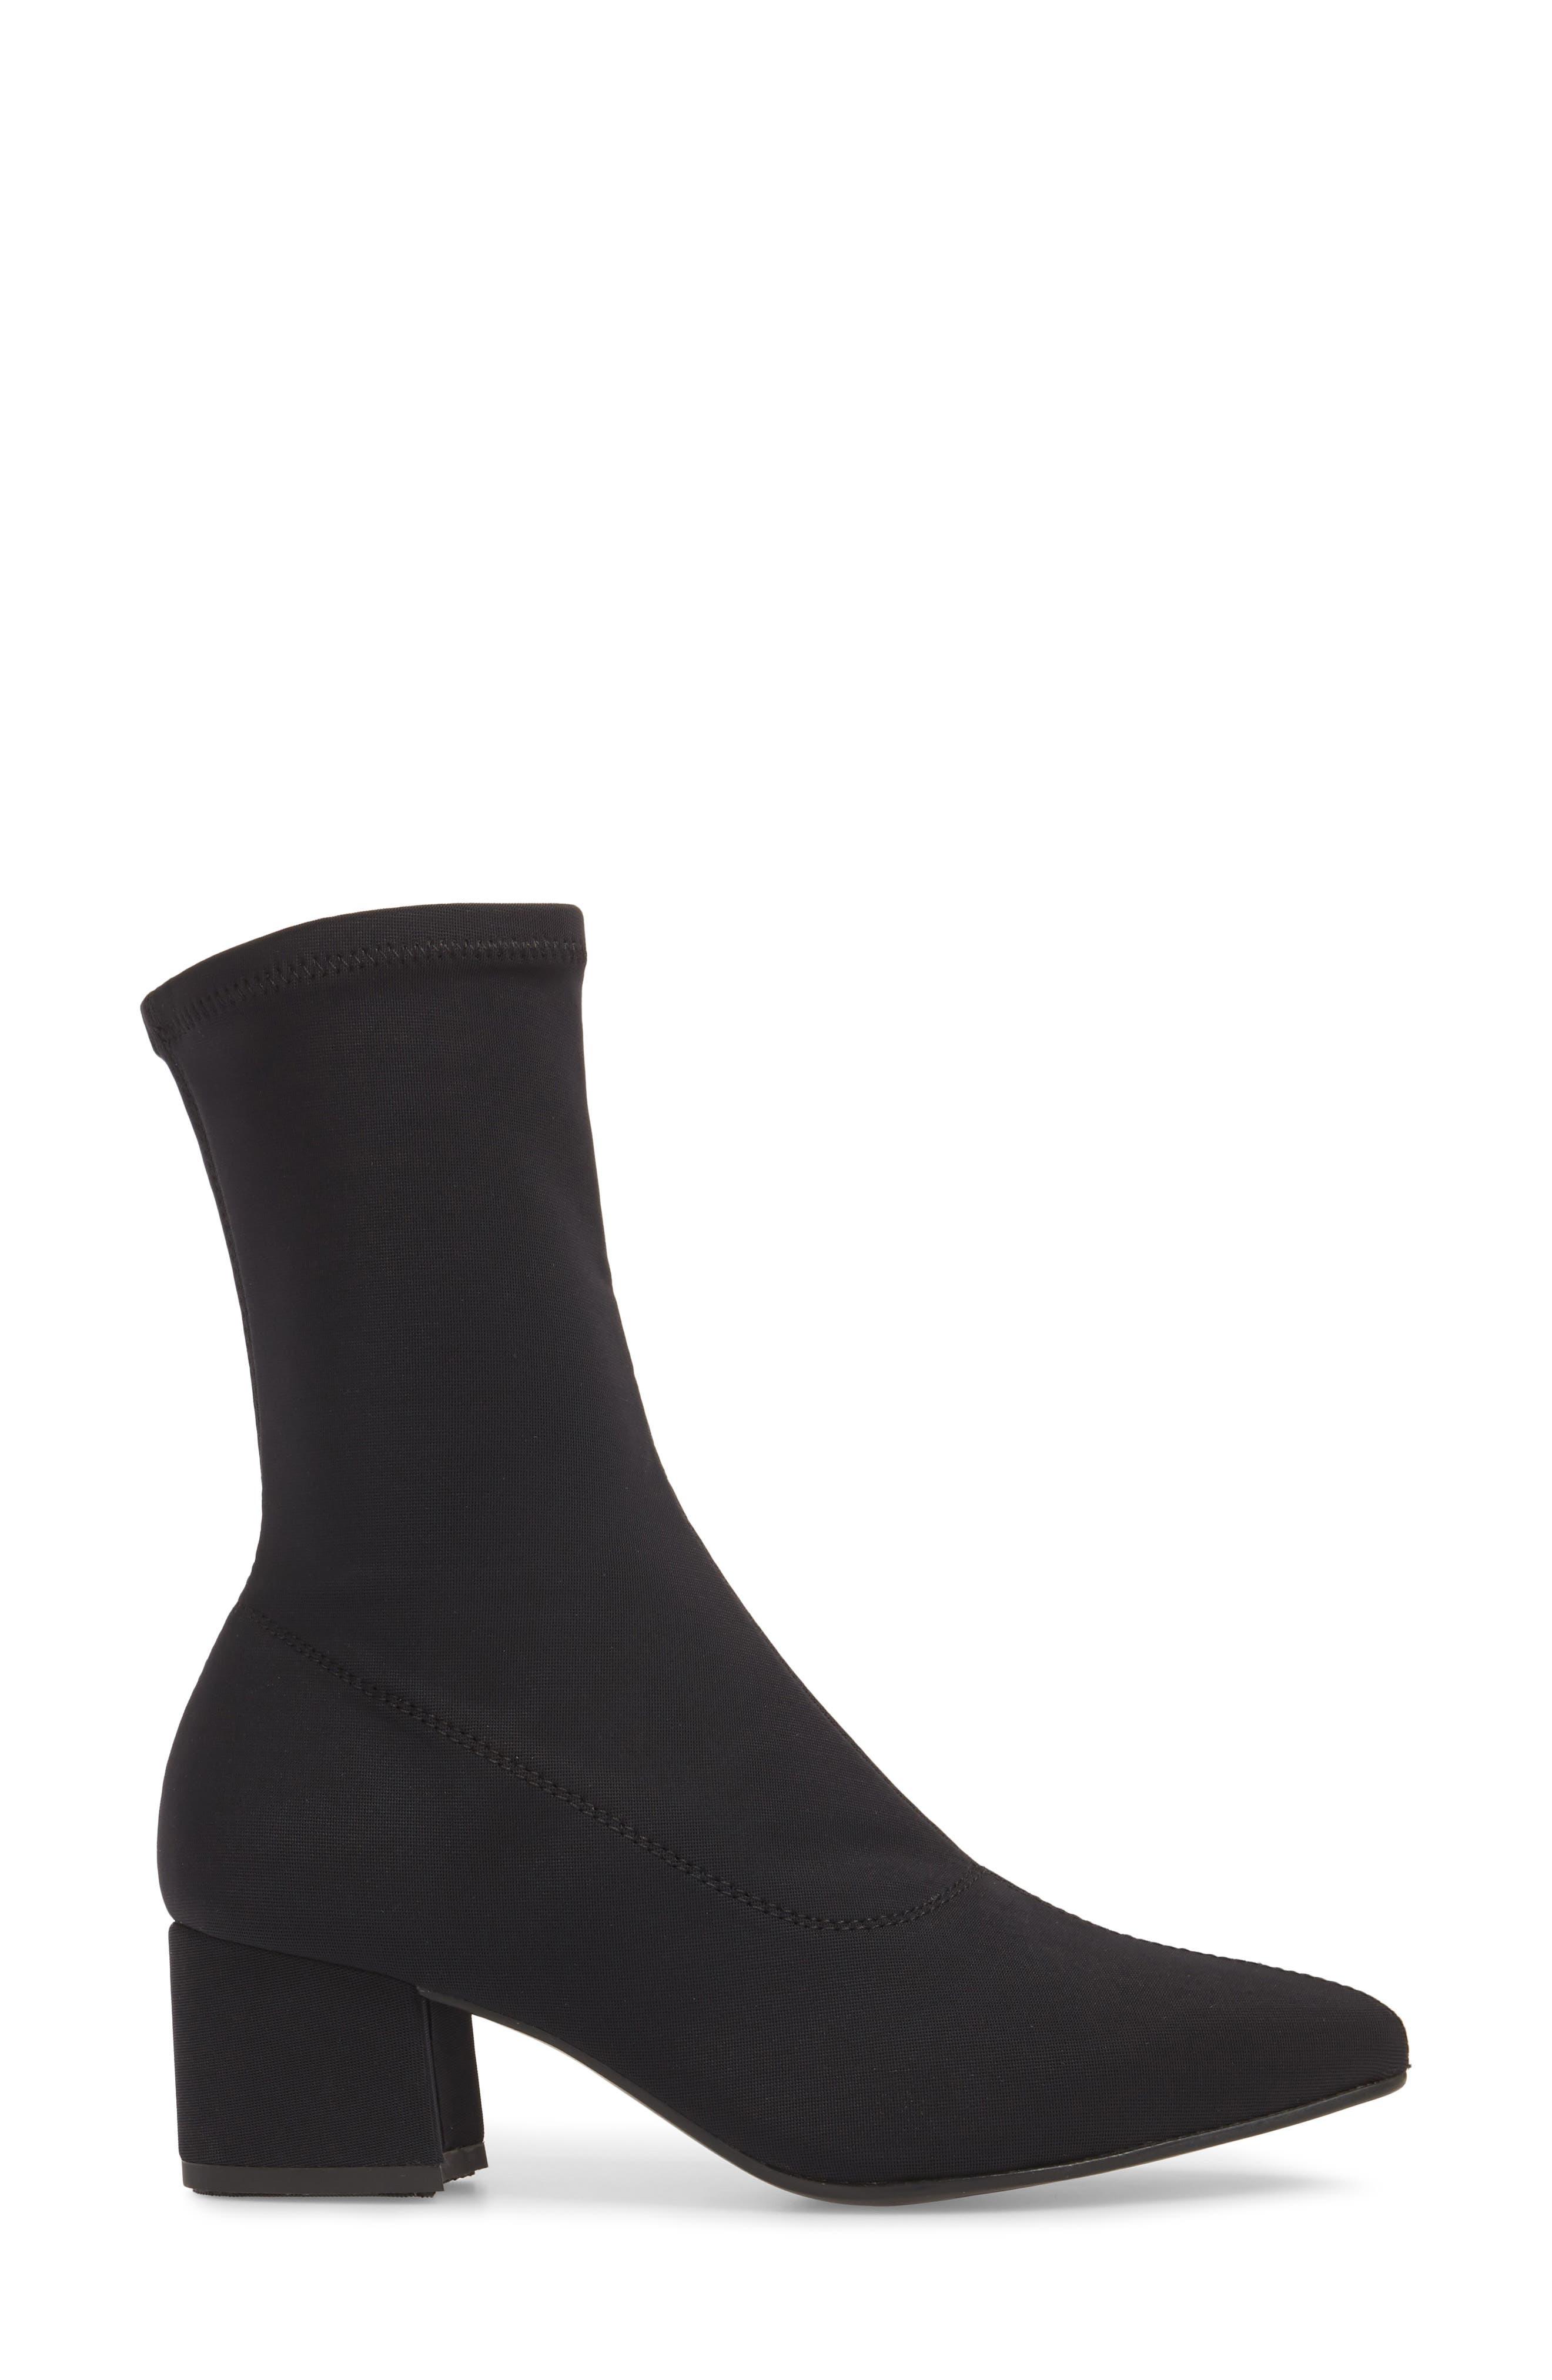 VAGABOND, Shoemakers Maya Stretch Bootie, Alternate thumbnail 3, color, BLACK FABRIC